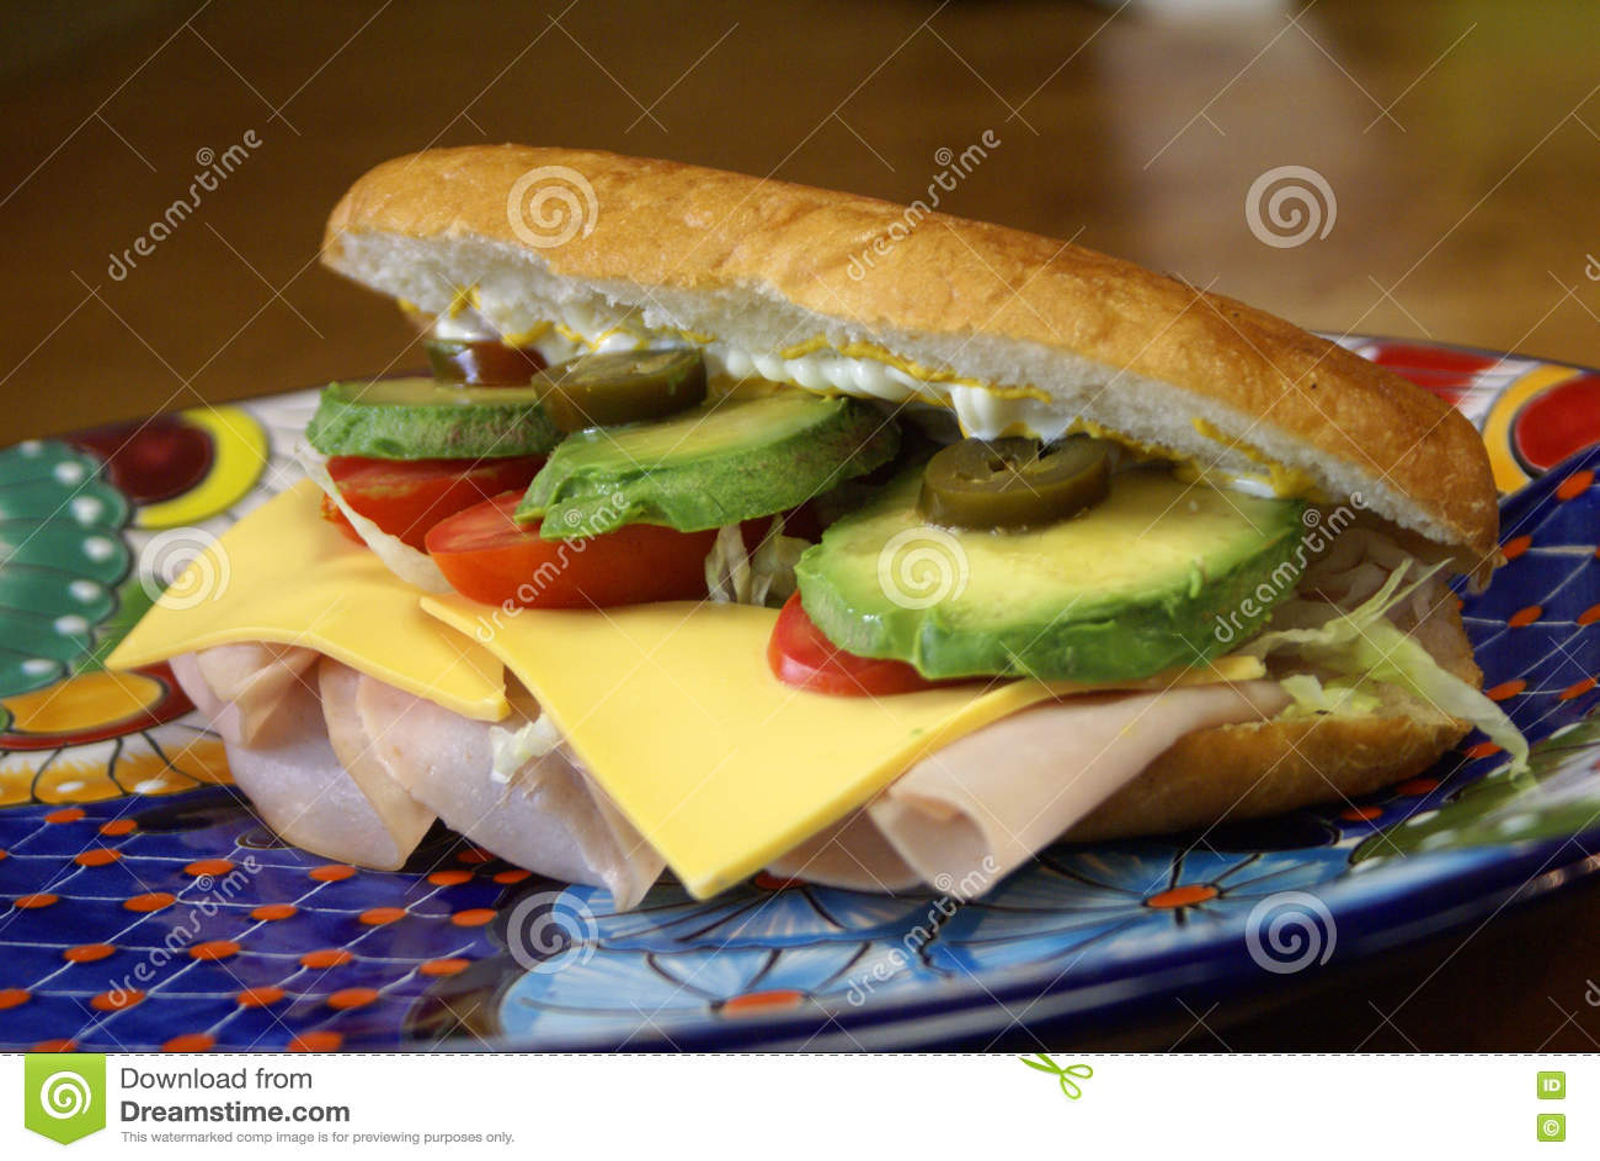 torta de jamon sandwich stock image image of avocado